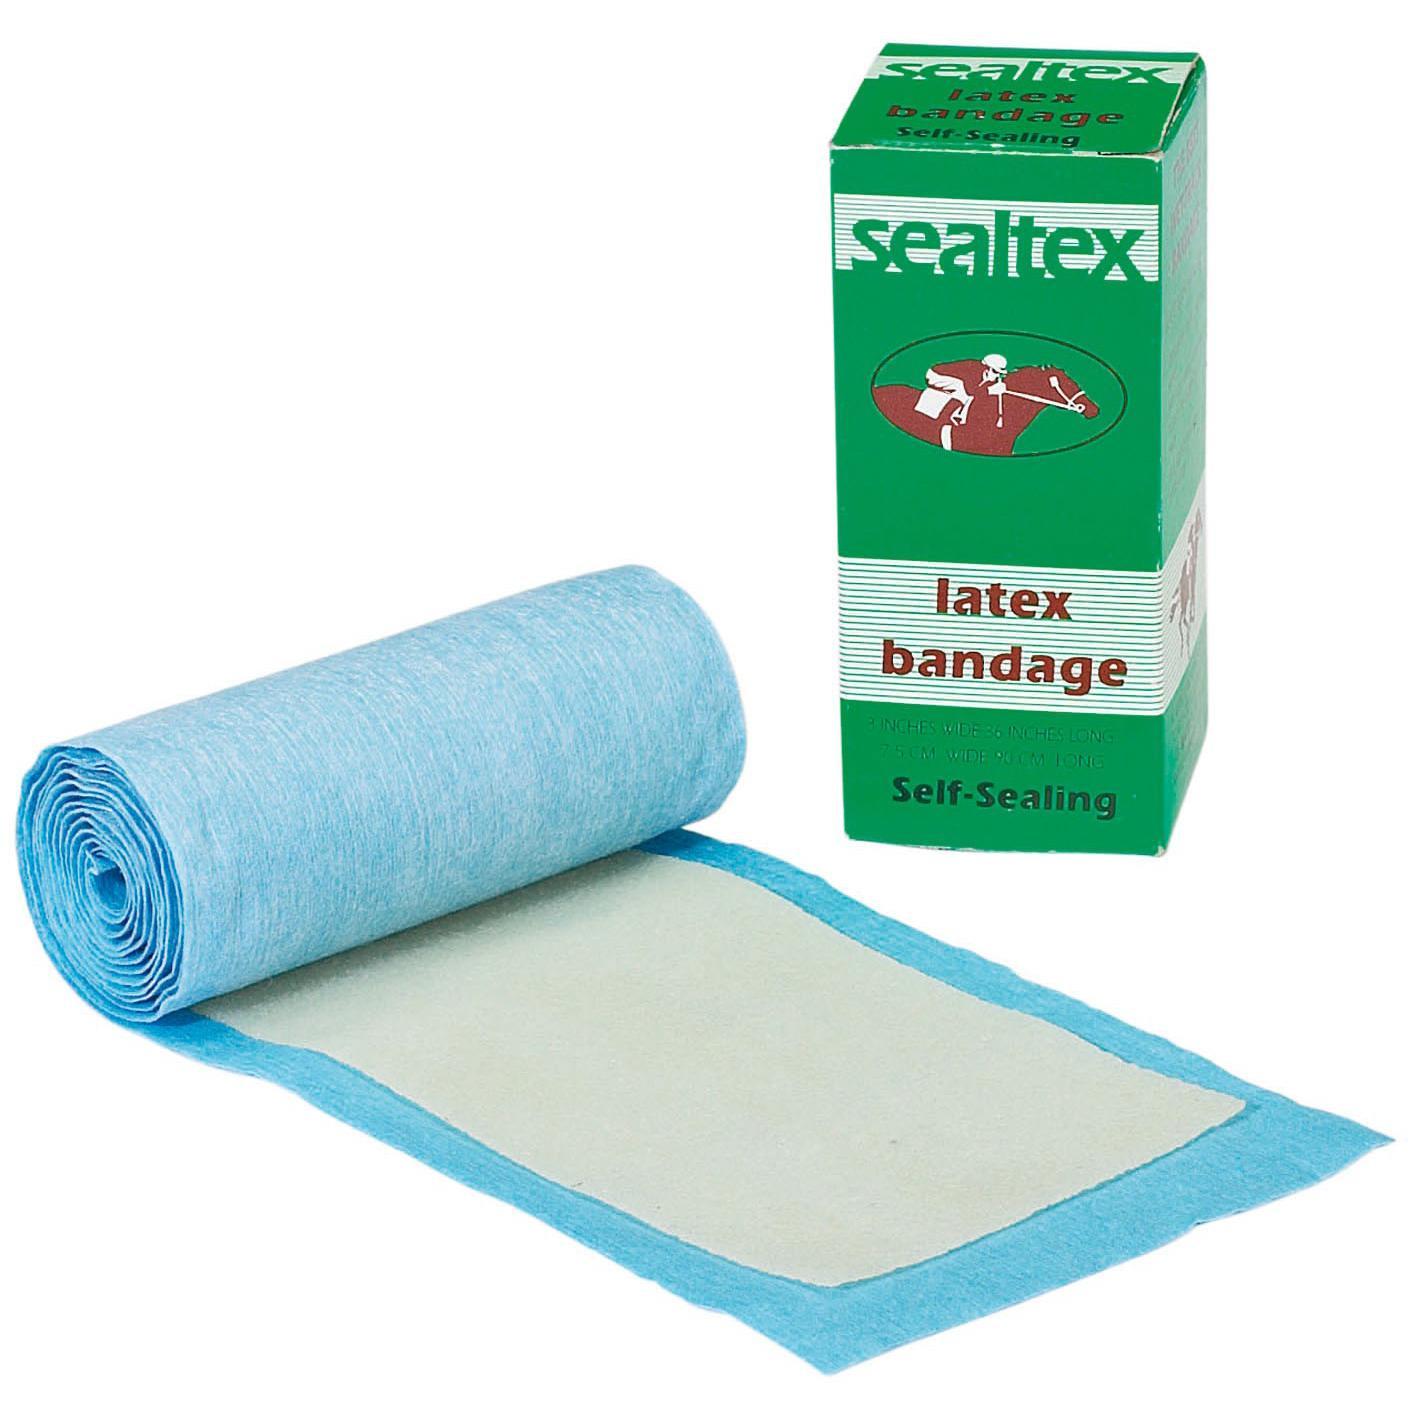 Laytex Bandage [Sealtex}